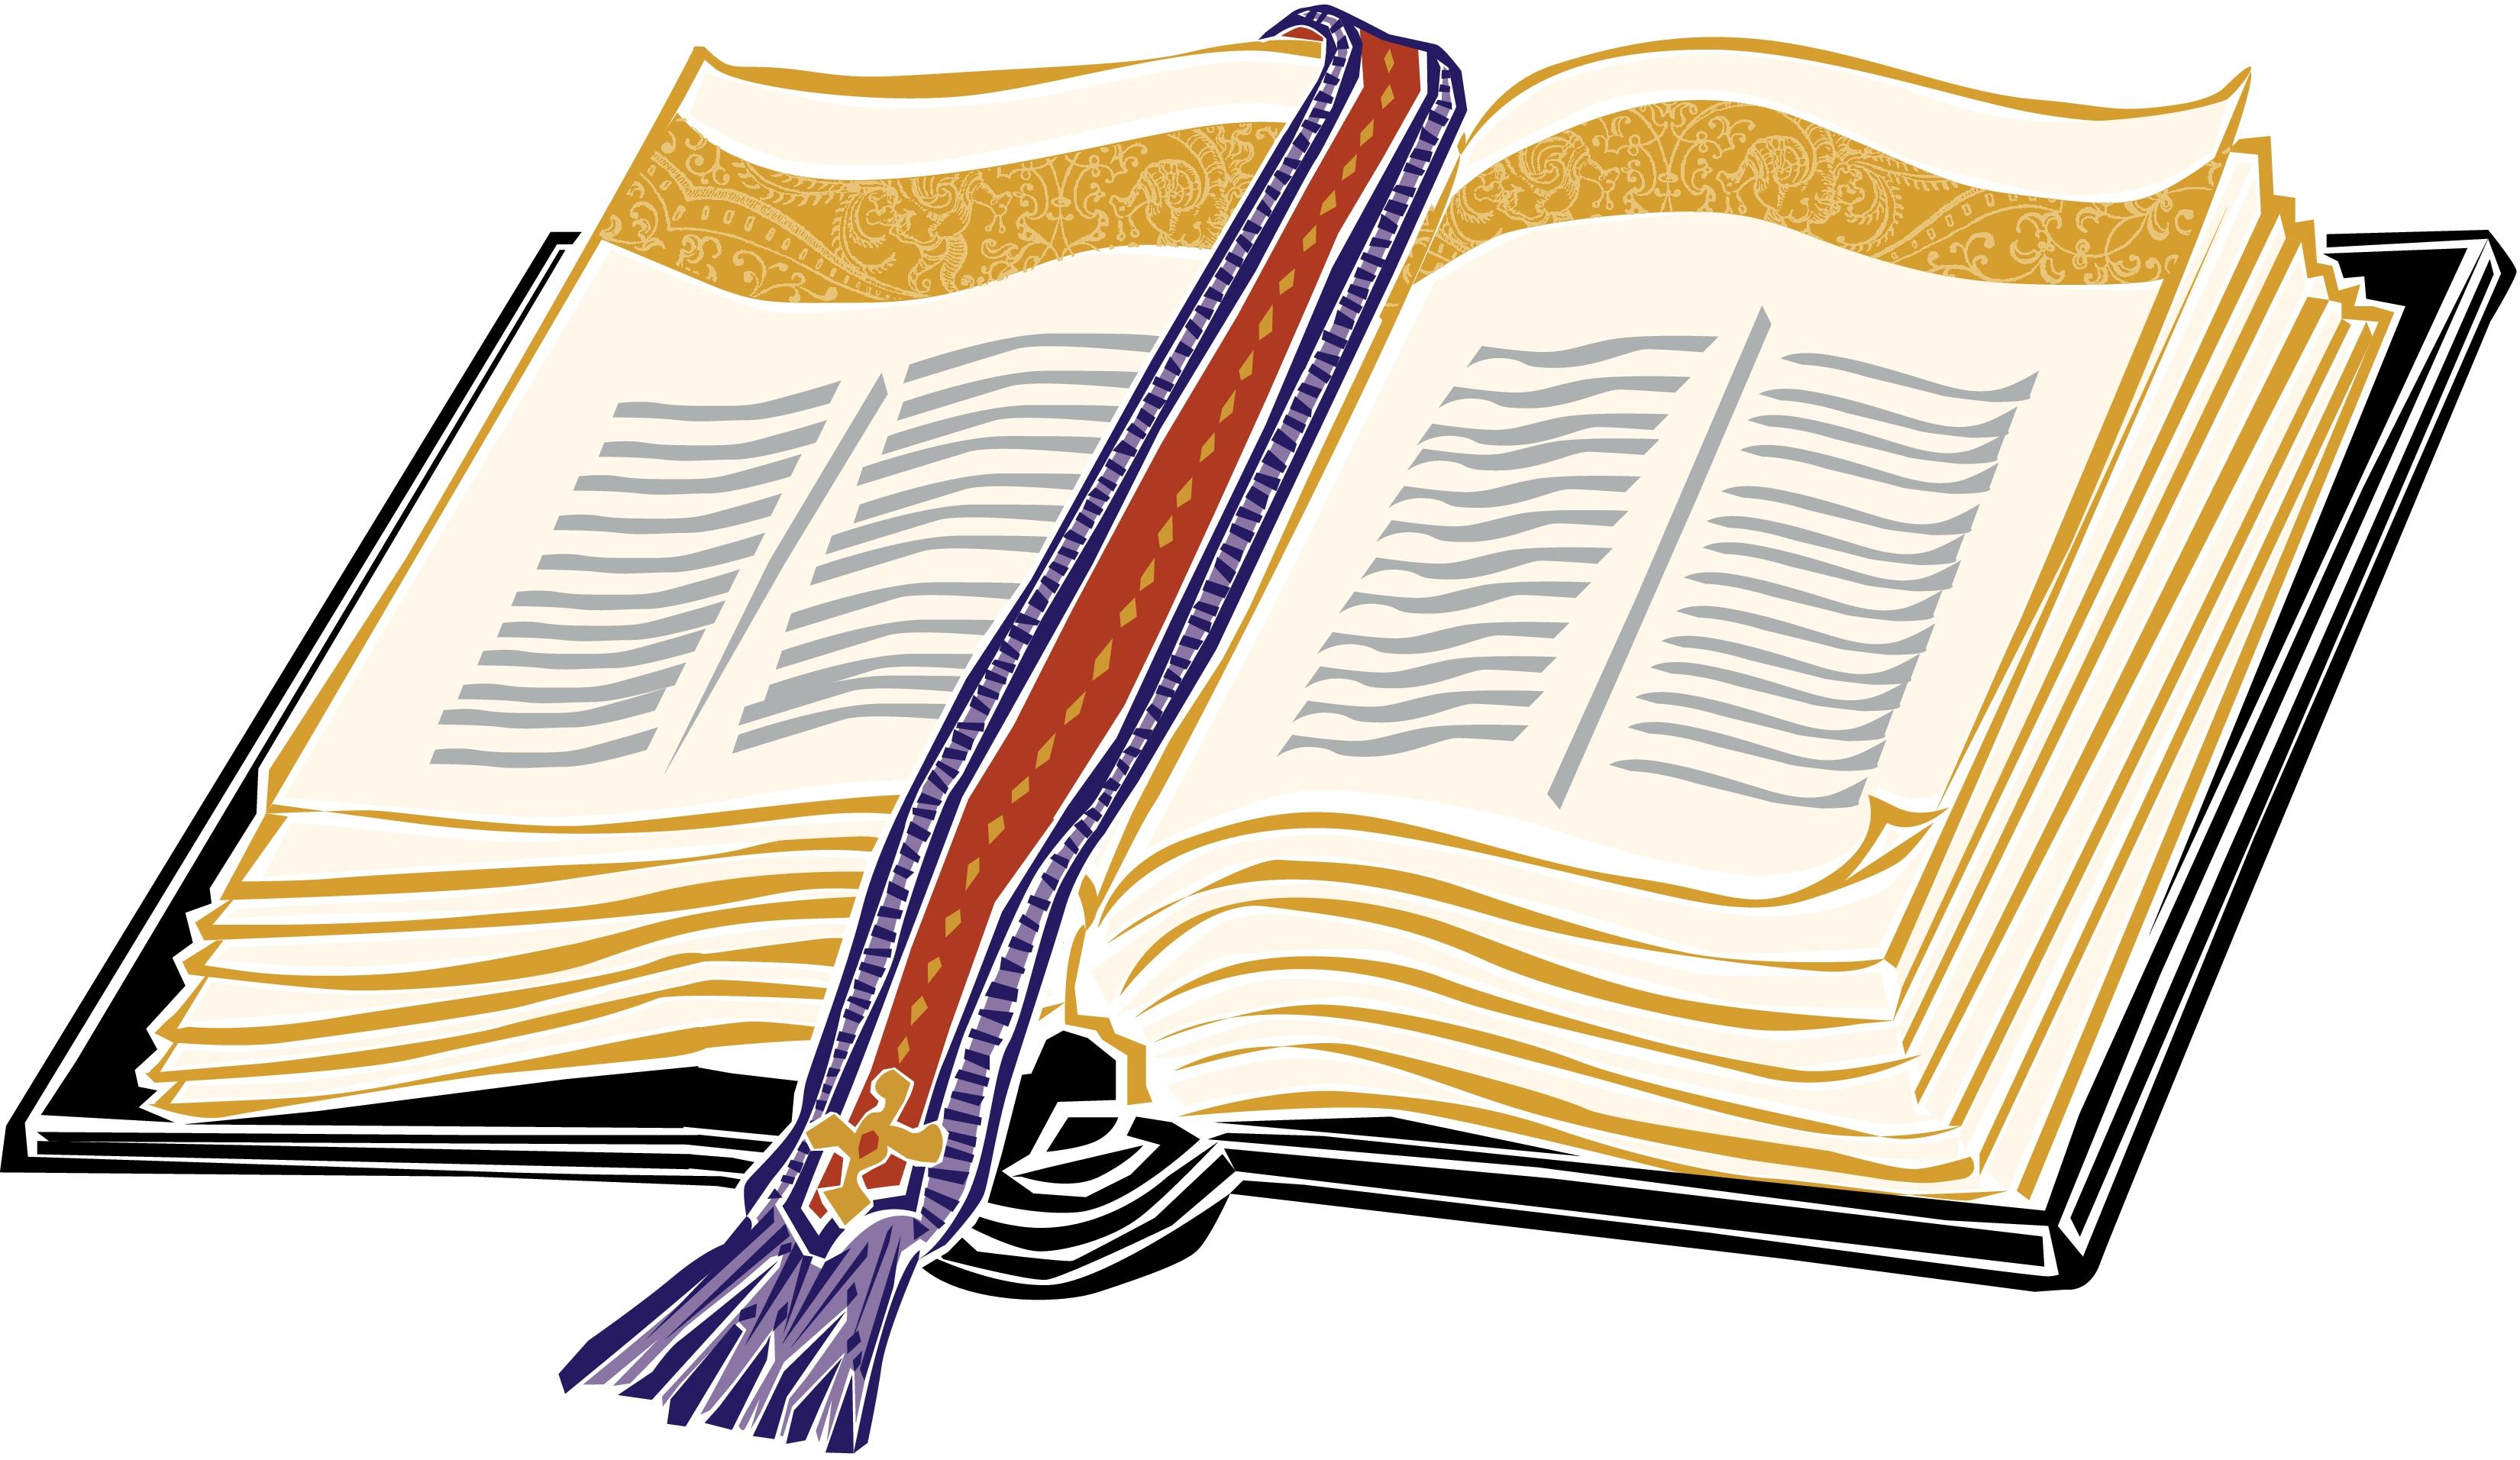 3300x1912 Pretty Inspiration Clip Art Bible Clipart Image 5 Cliparting Com